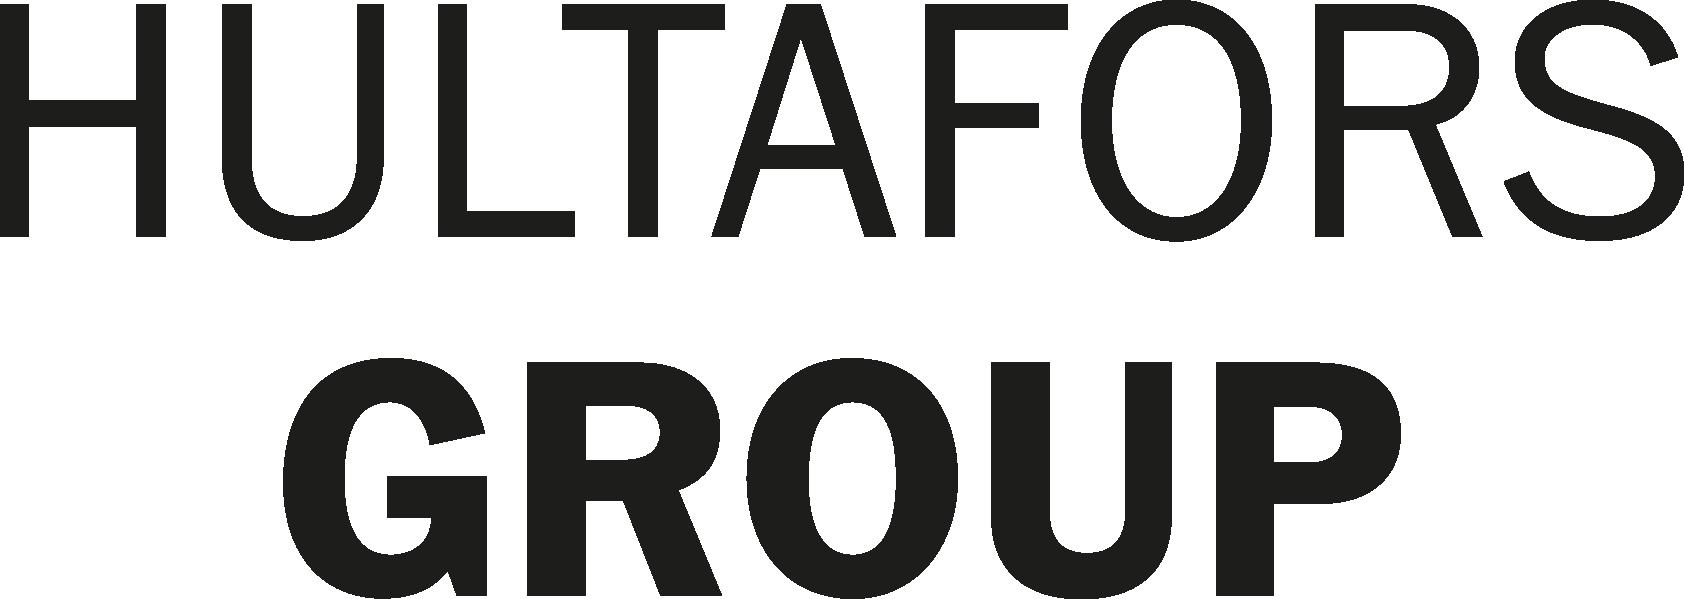 Hultafors Group